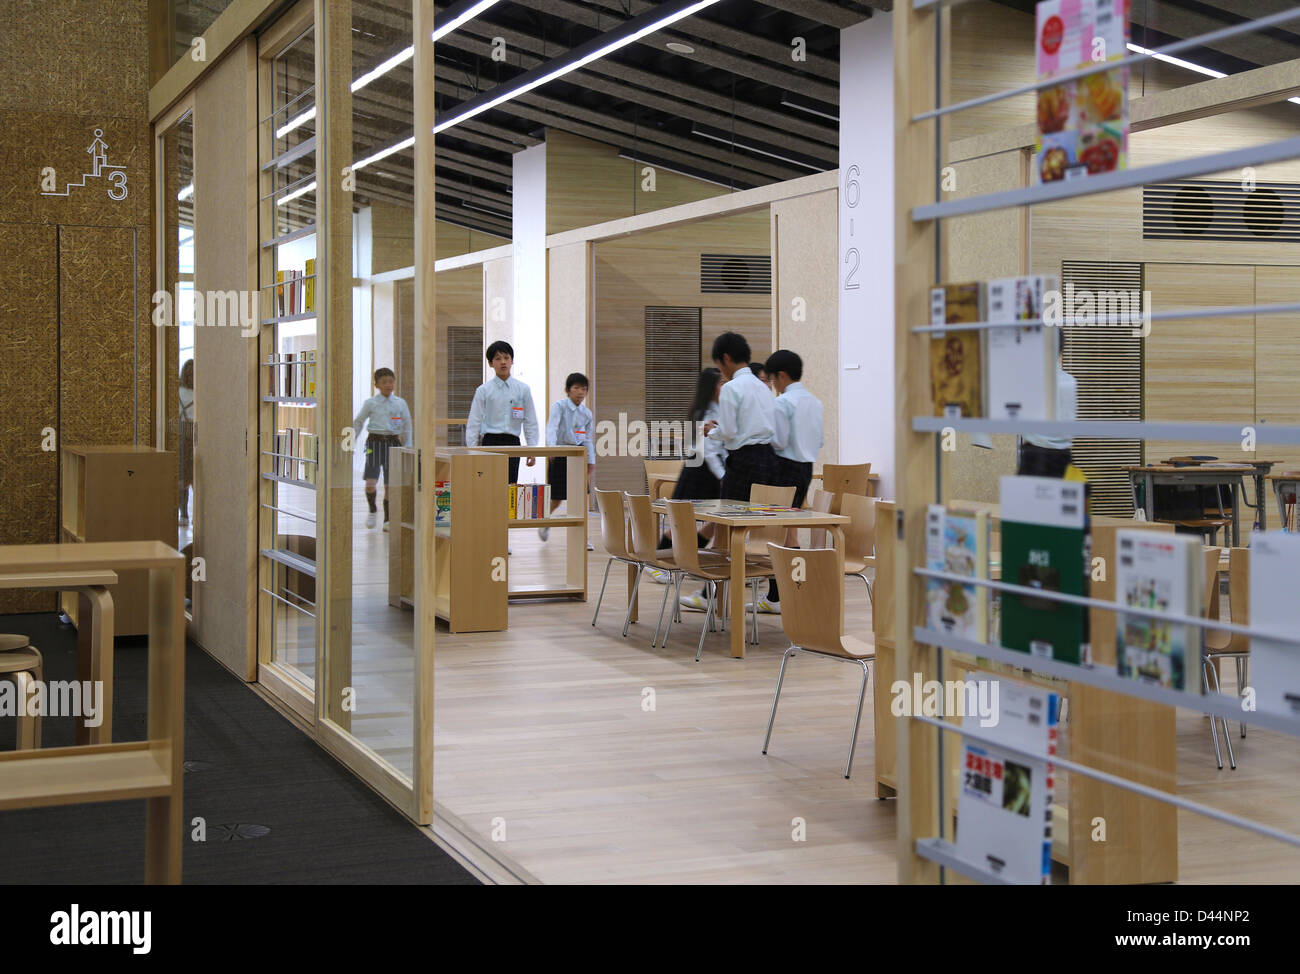 Good Teikyo University Elementary School, Tokyo, Japan. Architect: Kengo Kuma,  2012. Interior View Upper Floor.